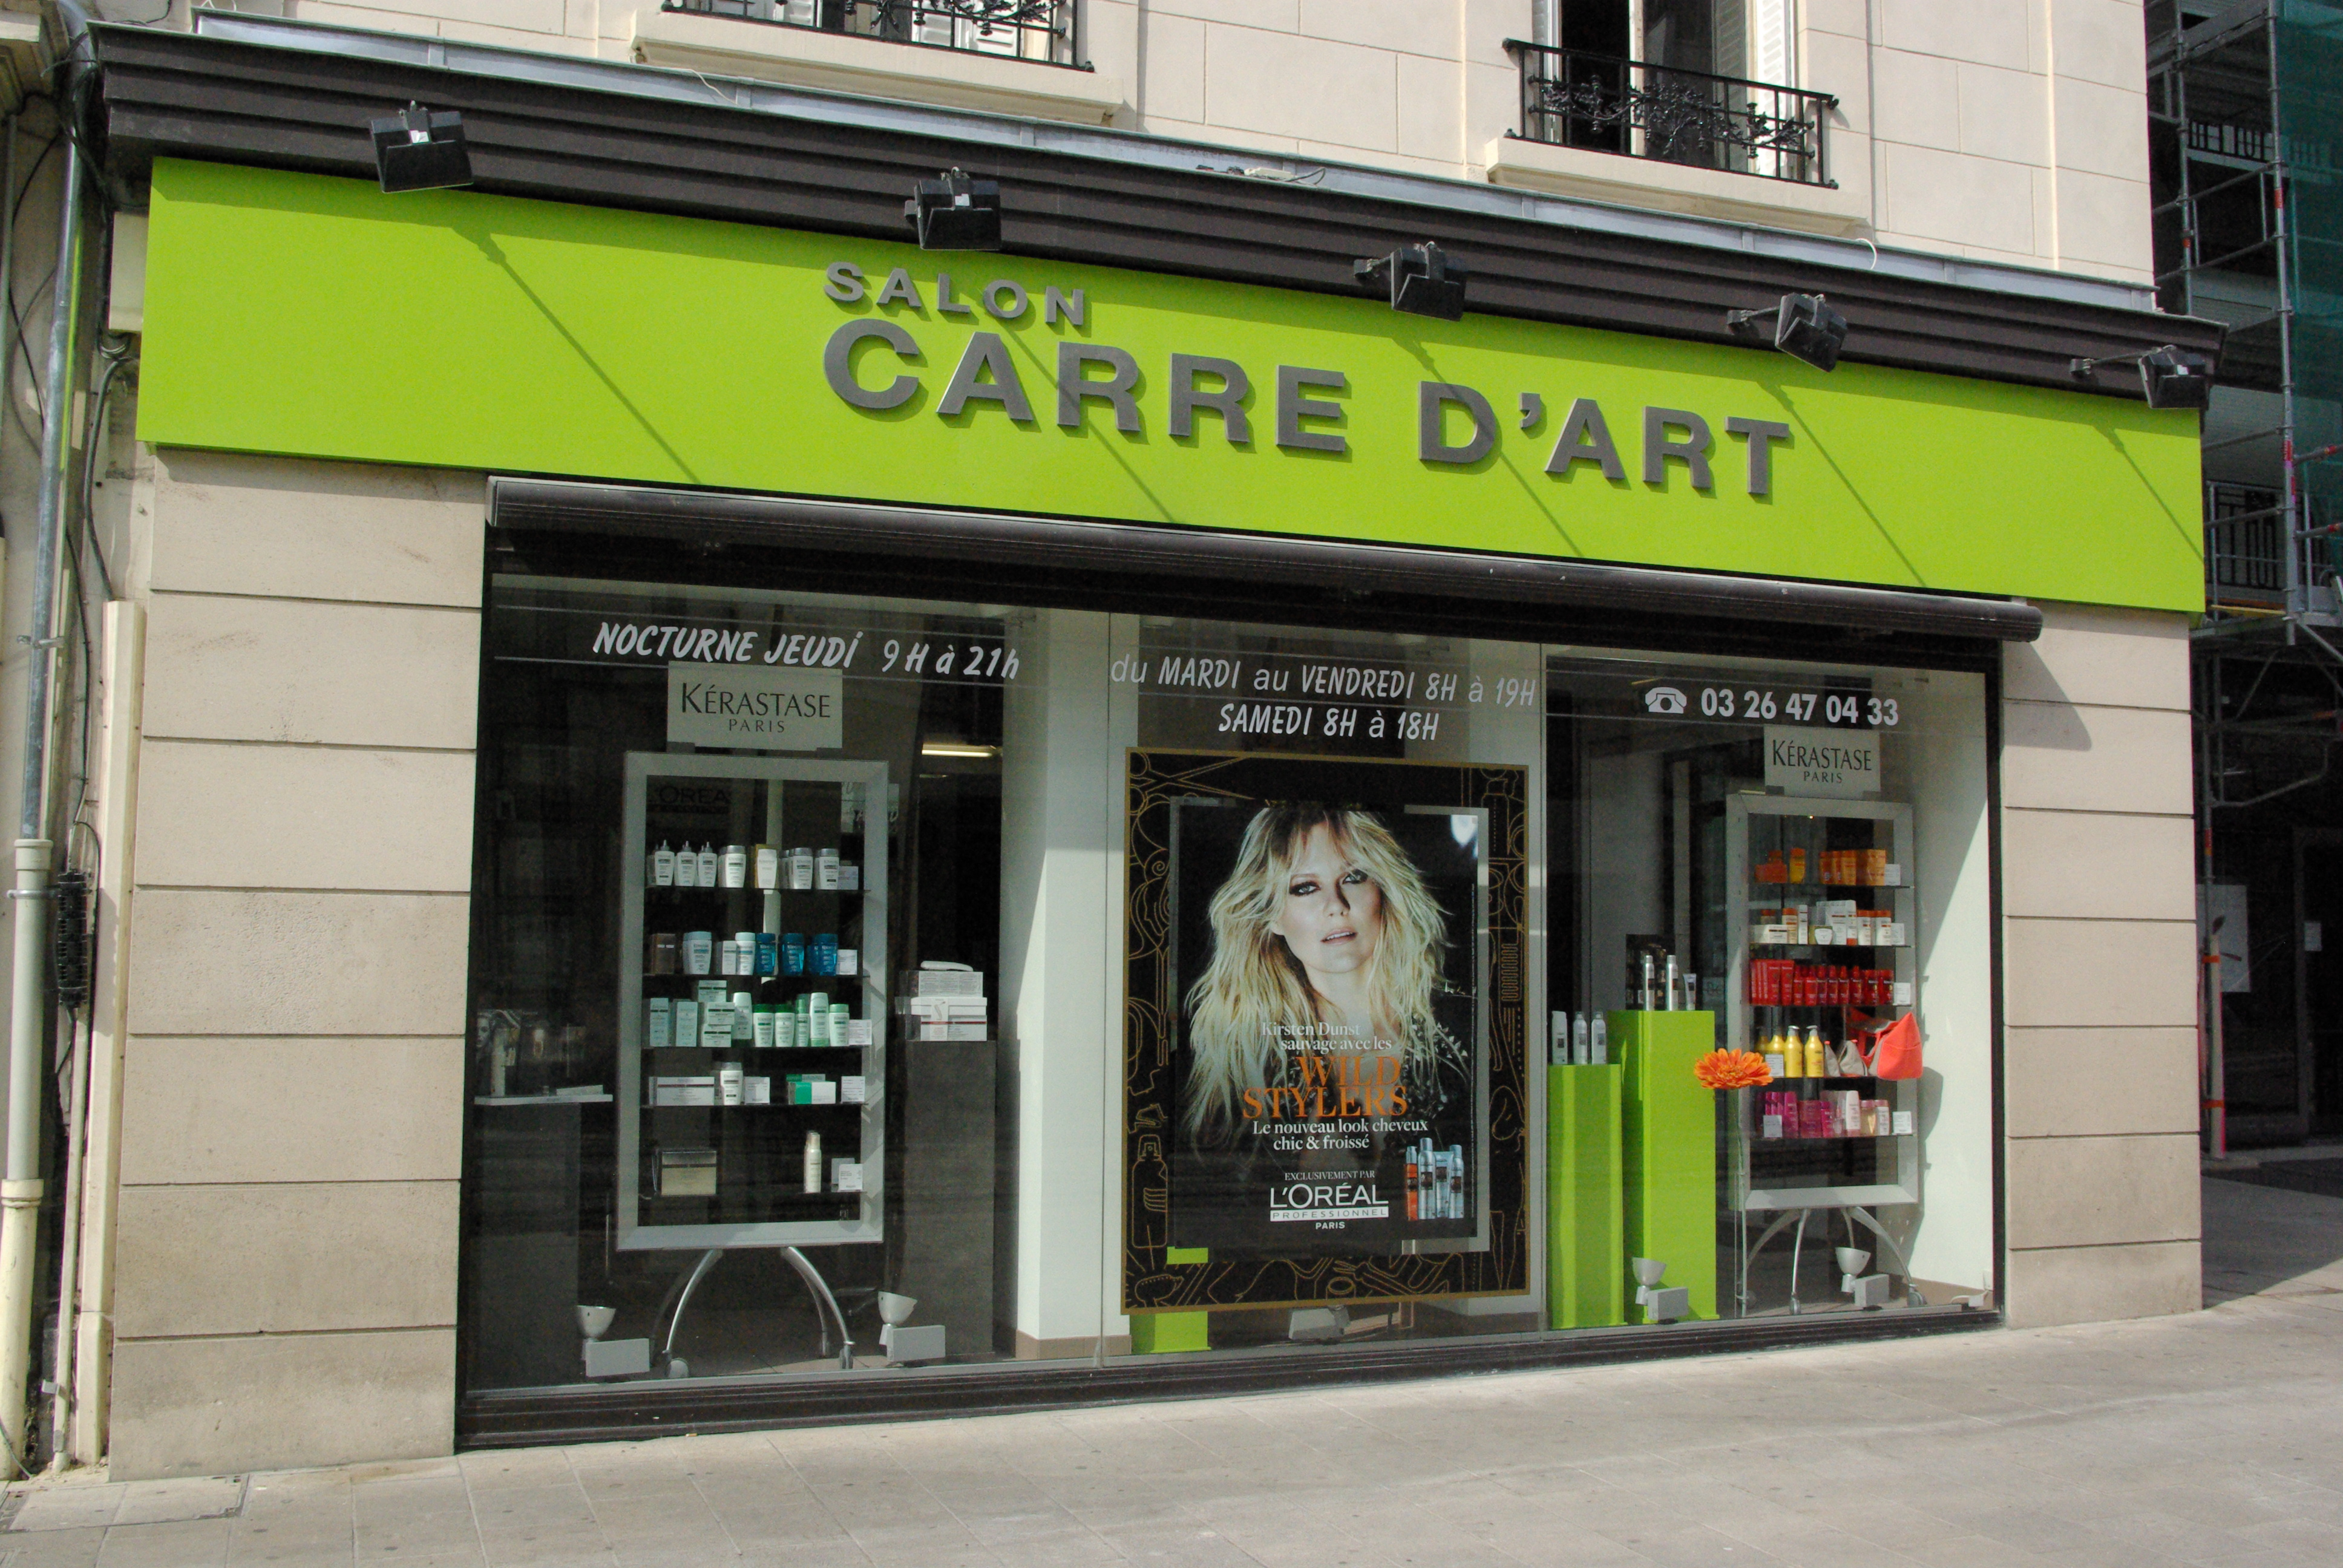 Salon Carré d'Art